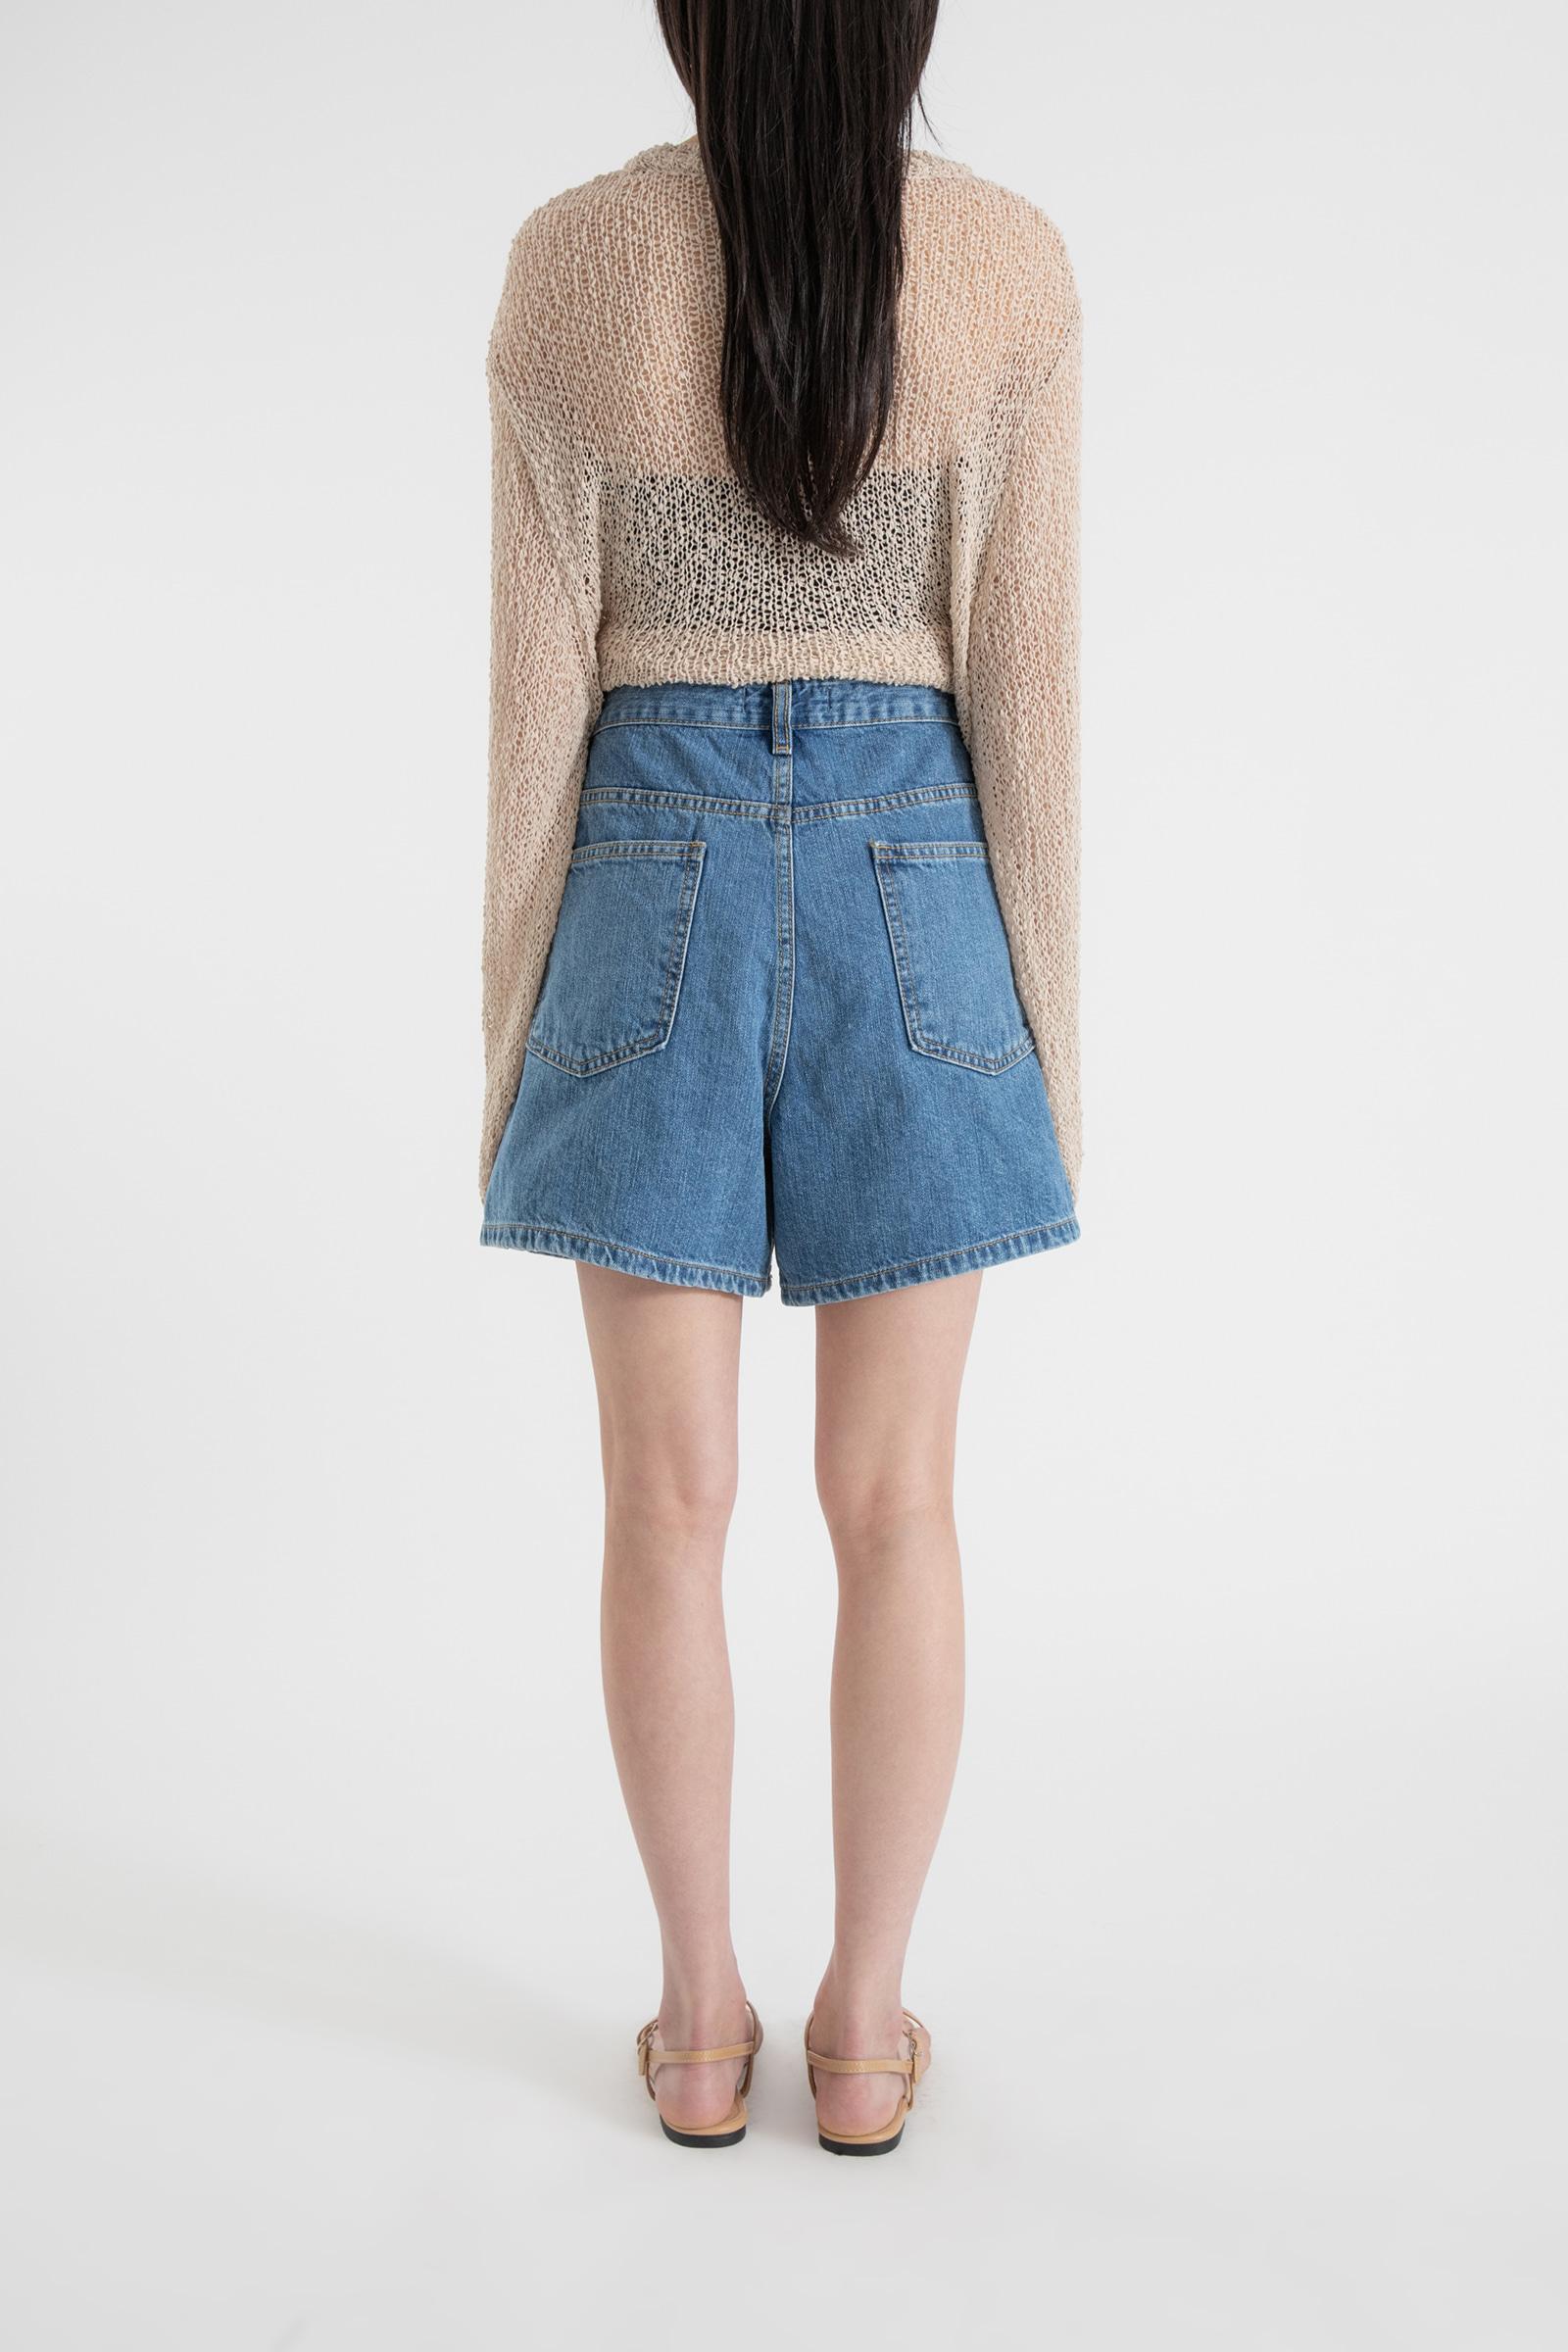 Select Free Button Half Jean